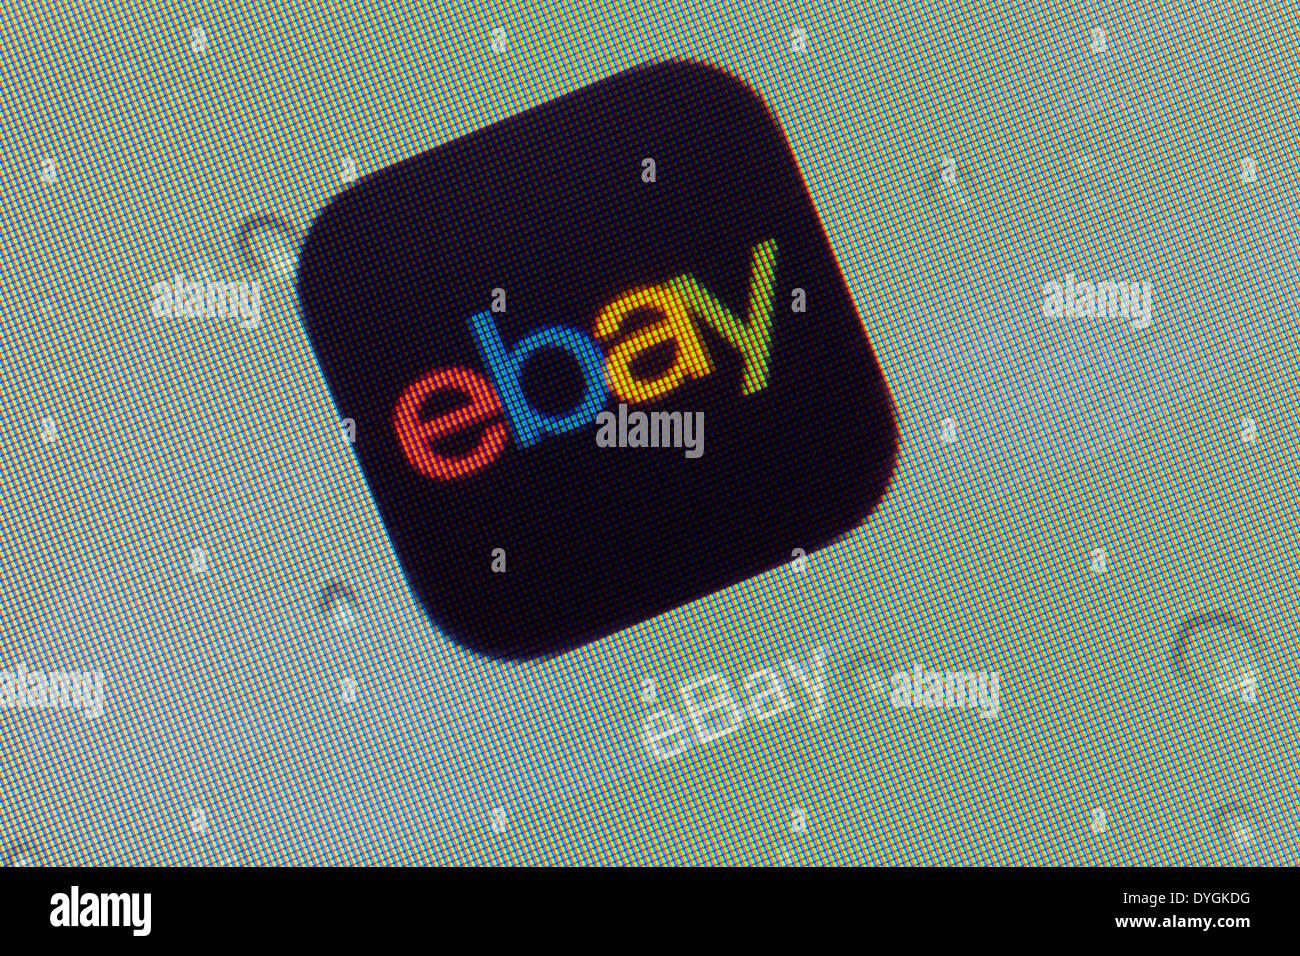 Ebay Logo App Icon On Ipad Apps Logos Icons Stock Photo Alamy